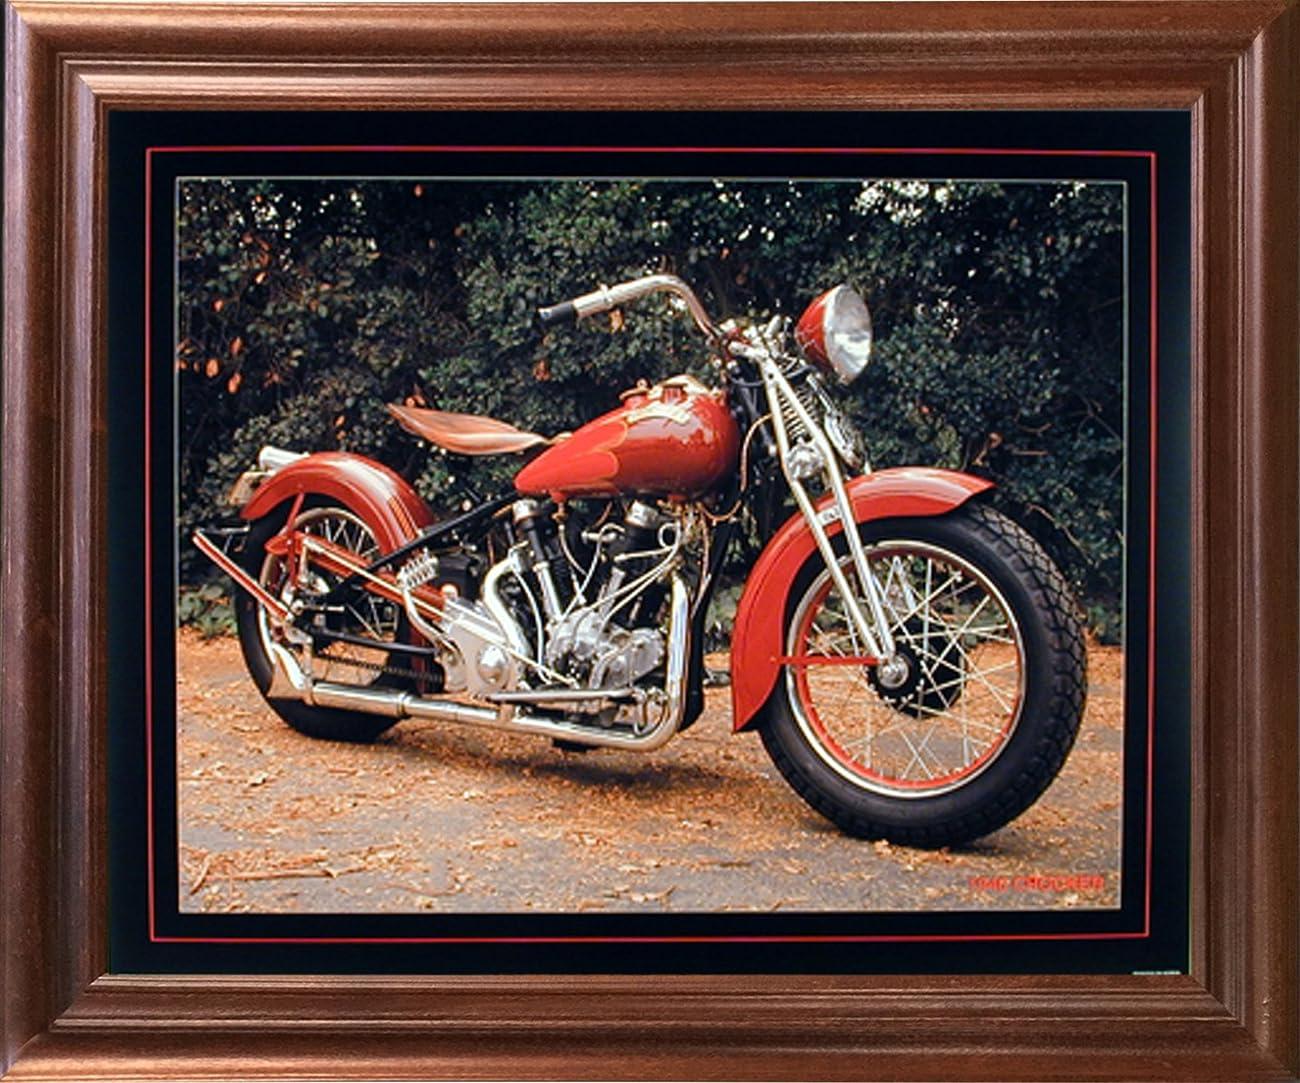 1940 Crocker Buck Lovell Vintage Motorcycle Mahogany Framed Picture Wall Art Print (18x22) 0